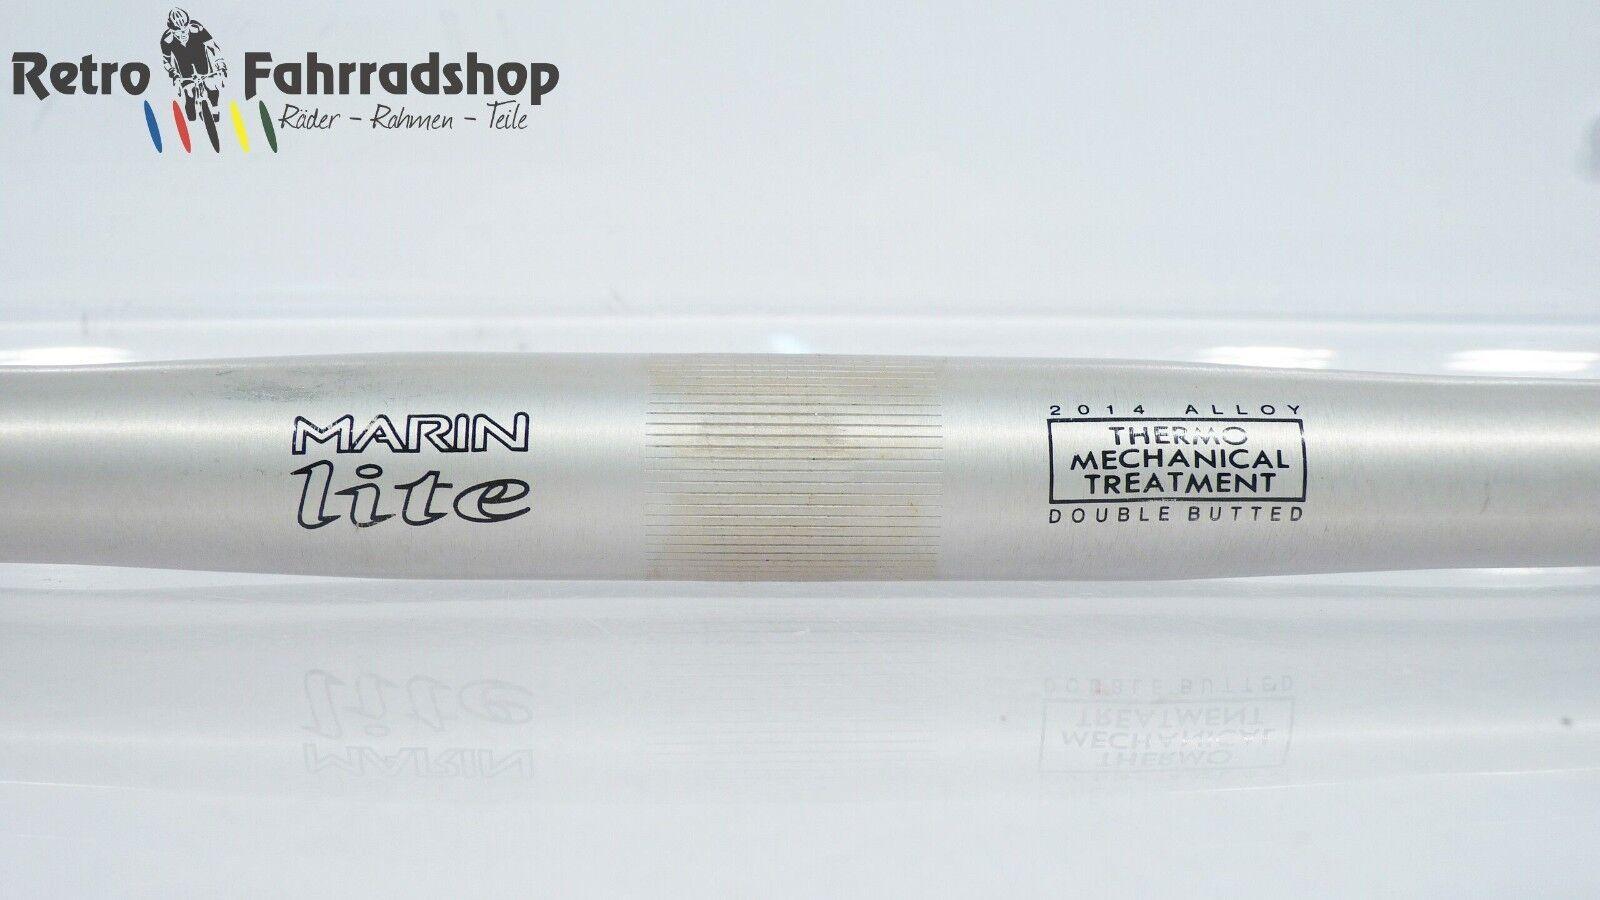 Marin lite Thermo Mechanical MTB Lenker Baujahr 1993 25,4mm  W580mm 150g RAR